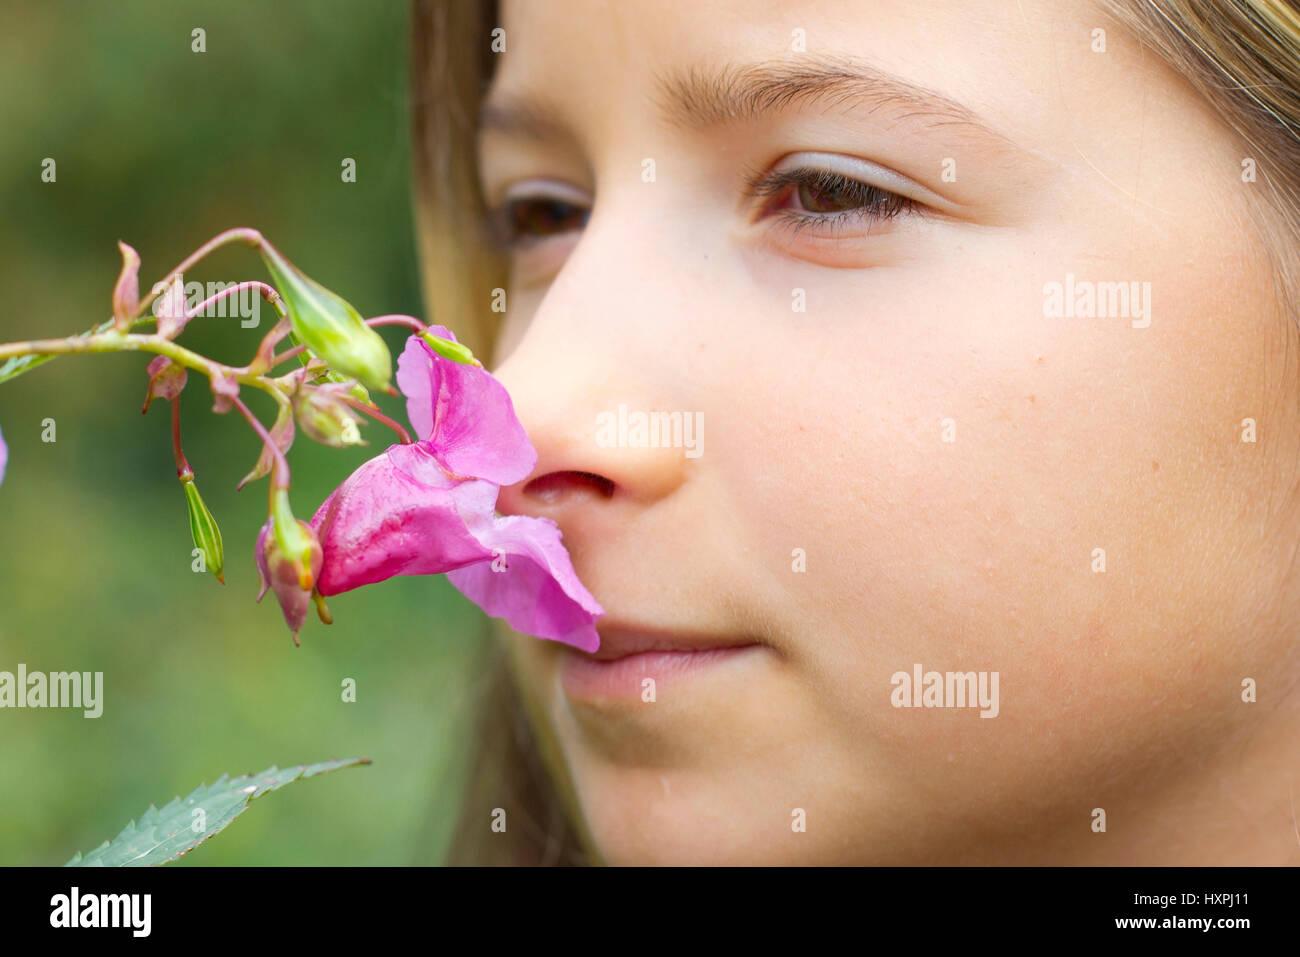 Impatiens glandulifera, Dr?siges Springkraut, India,Himalaya-Balsamine Springkraut,Bauernorchidee,Familie del Balsaminengew?chse (de las Balsamináceas) Foto de stock